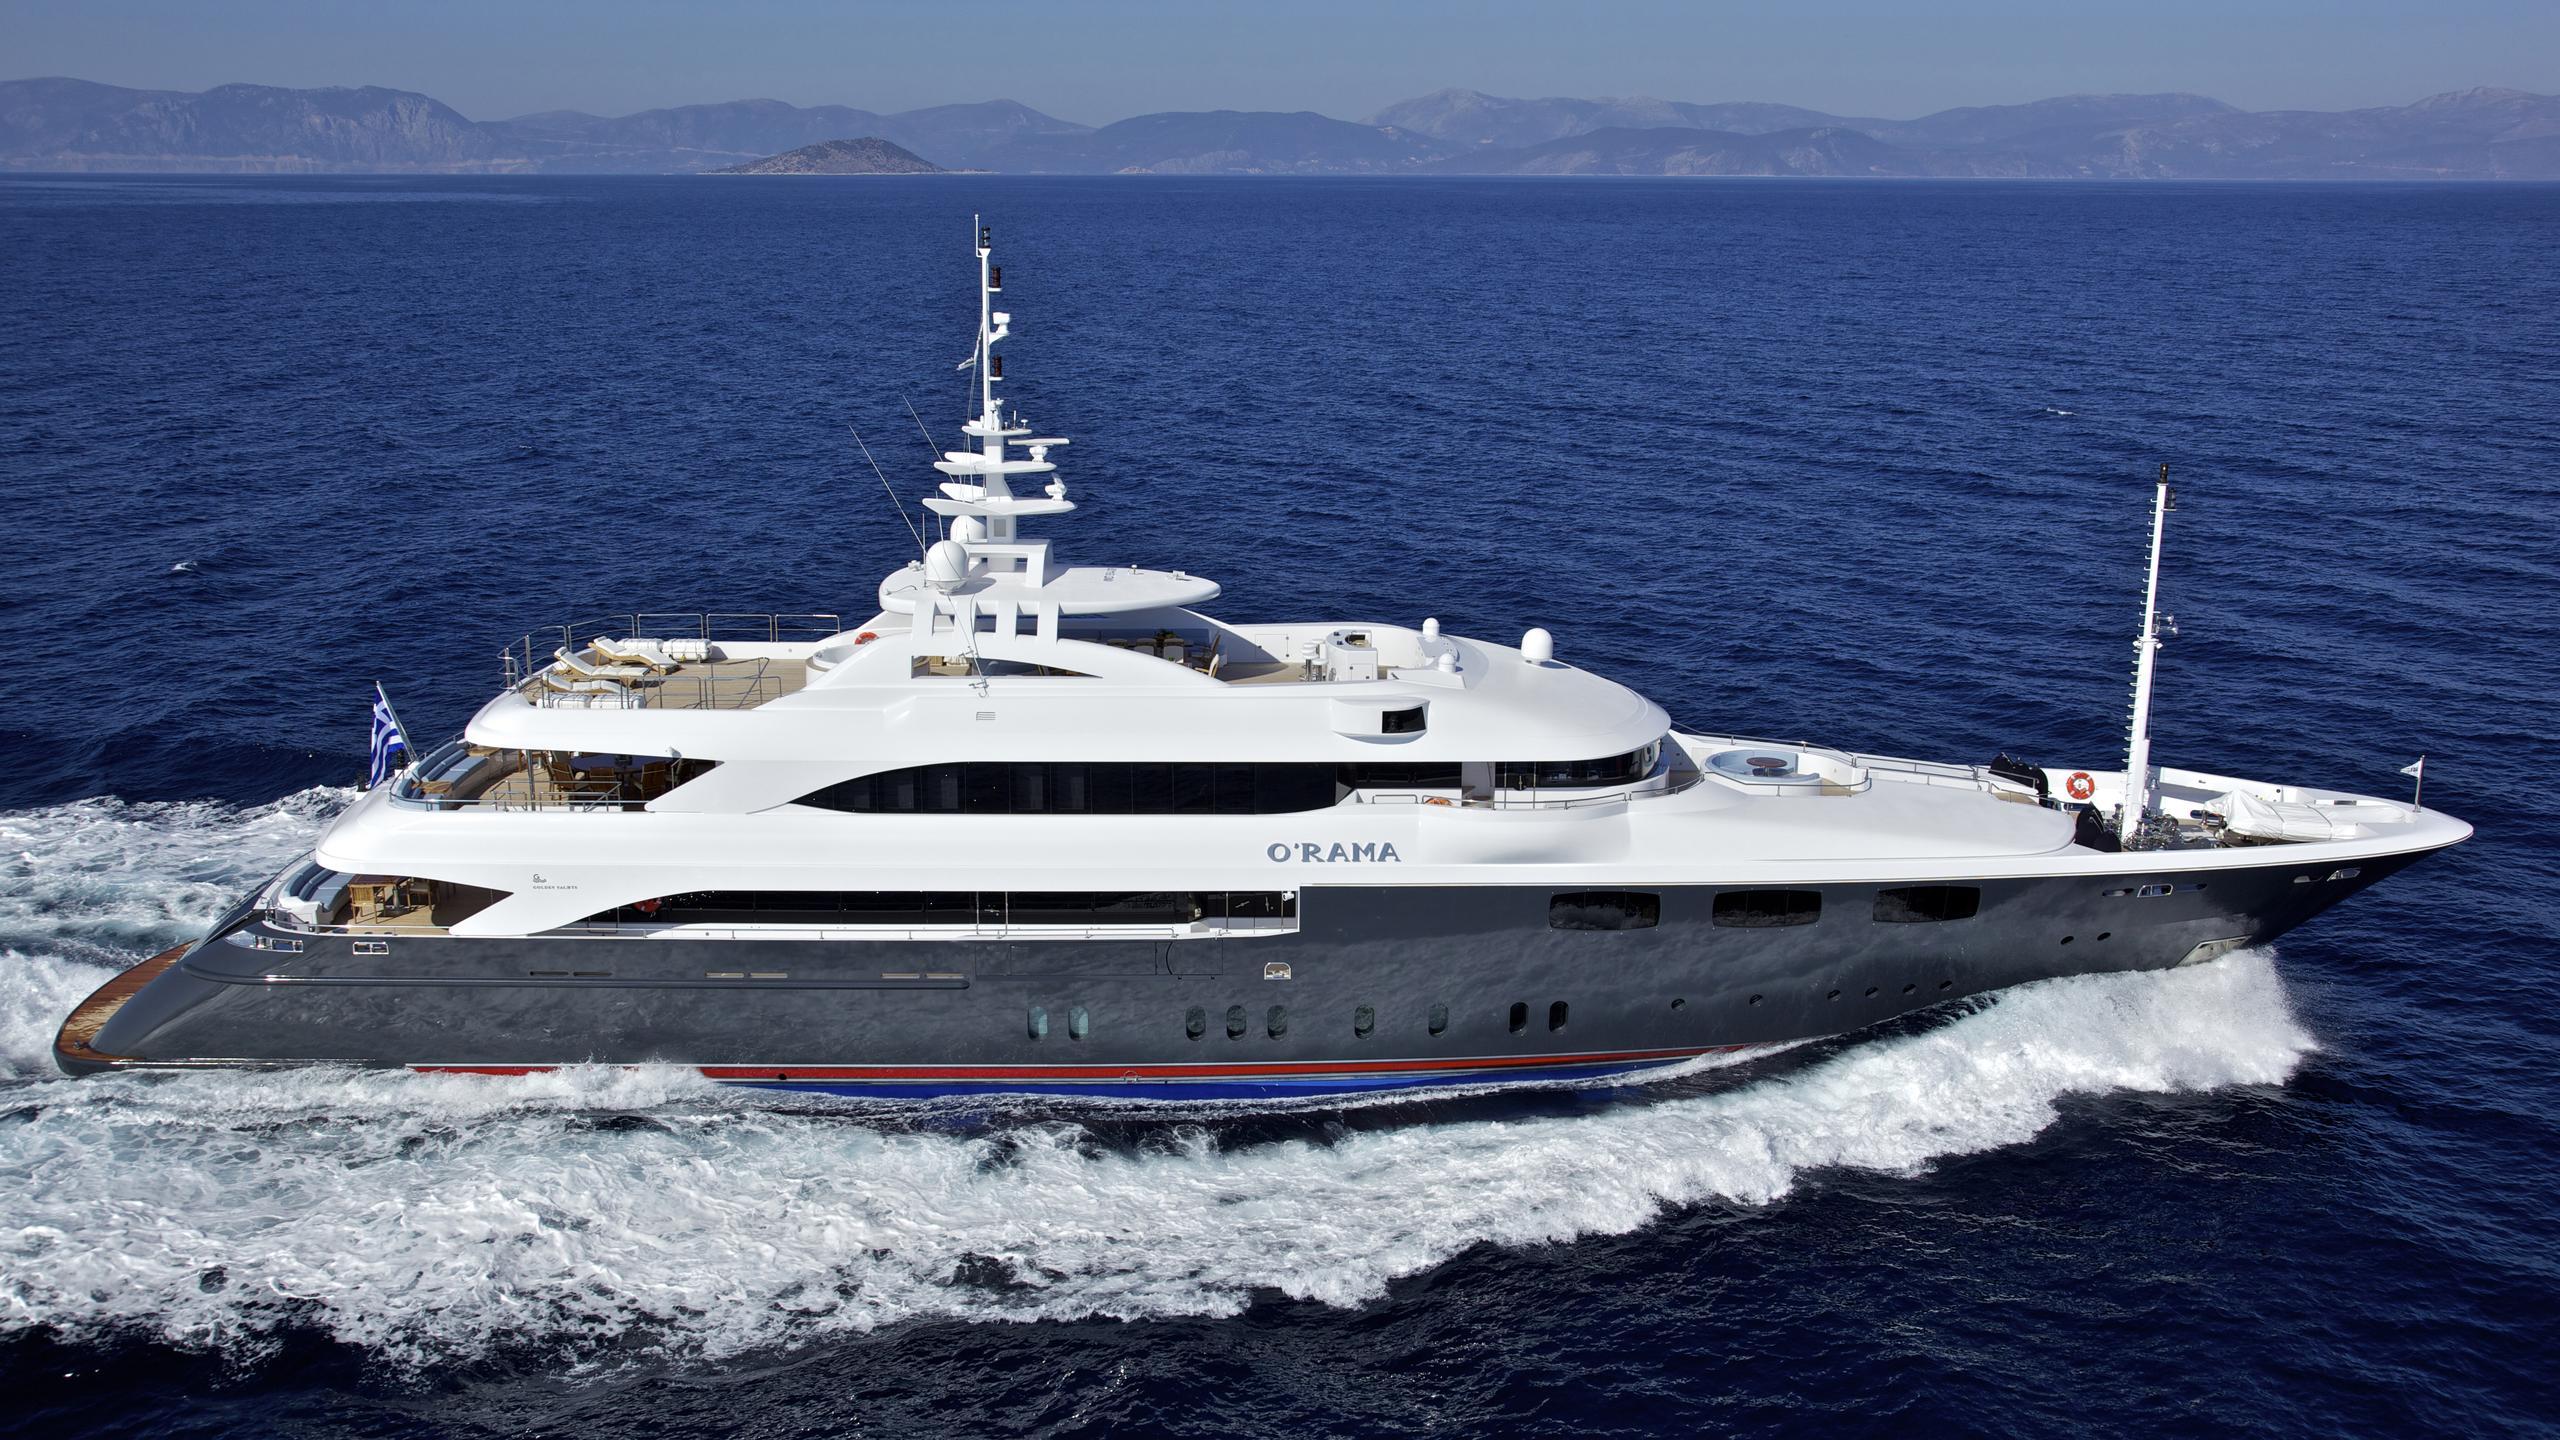 o'rama-yacht-for-sale-profile